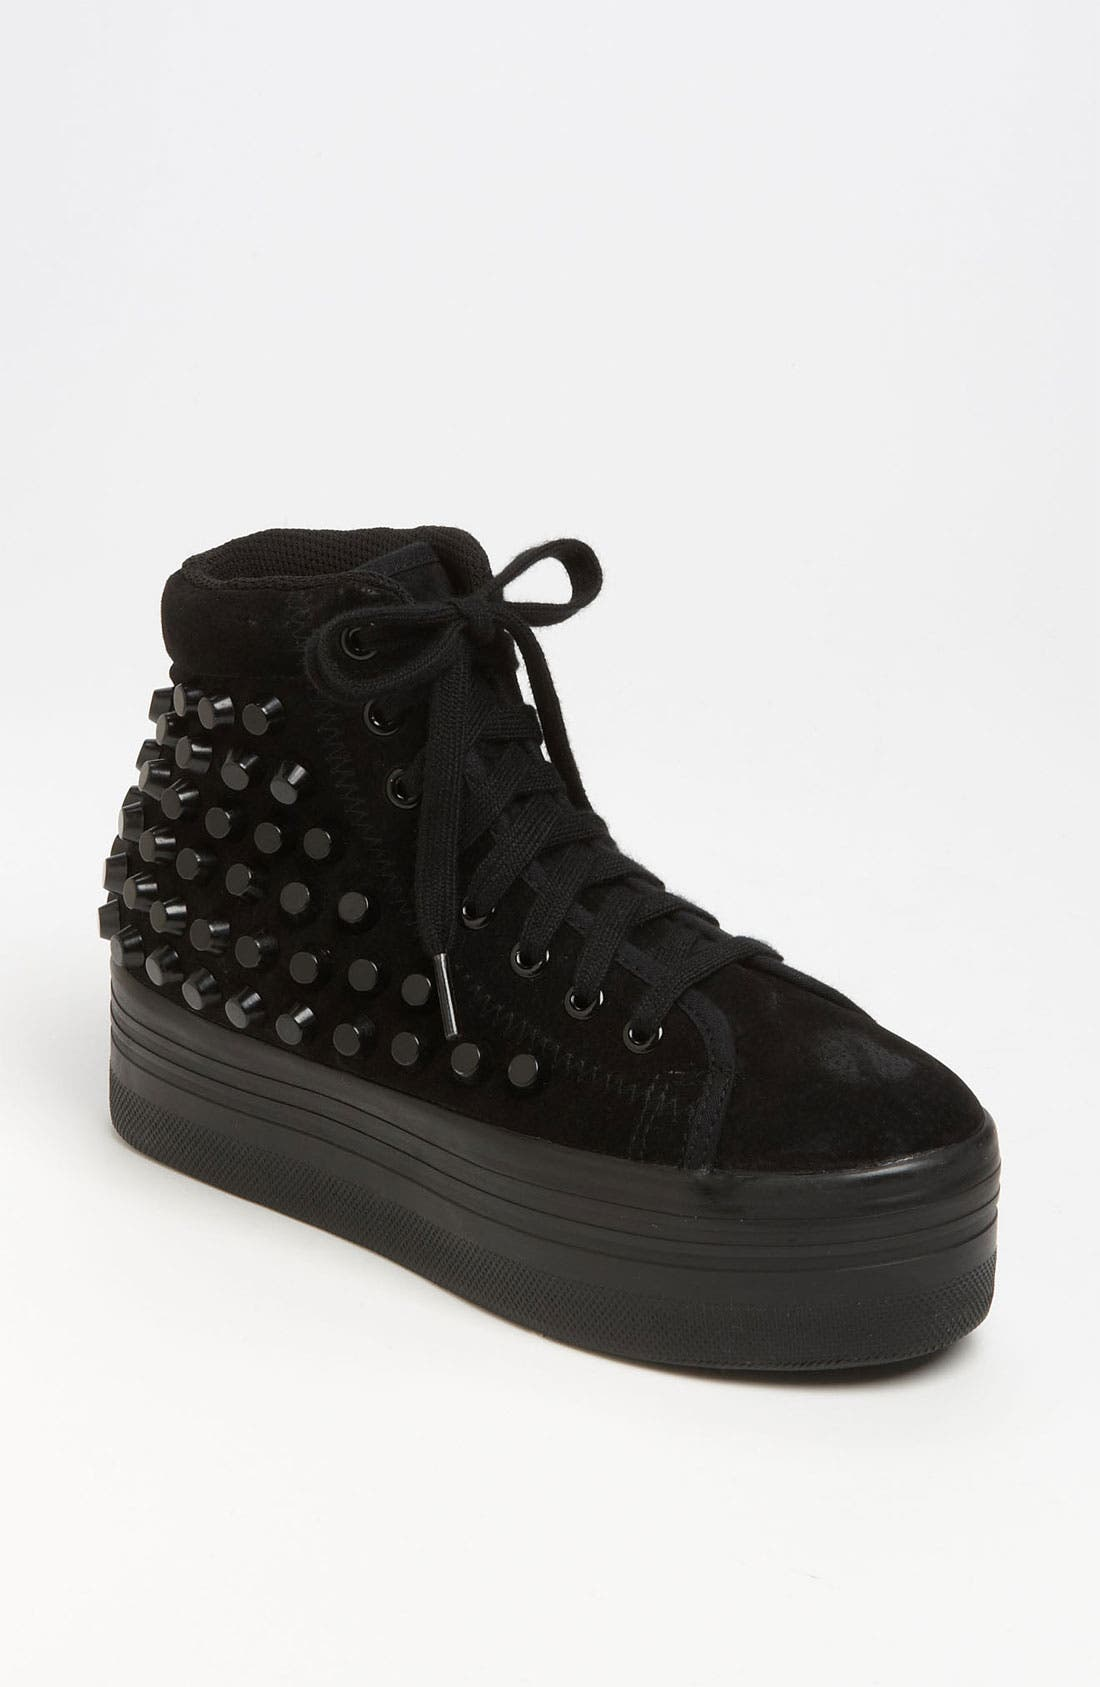 Alternate Image 1 Selected - Jeffrey Campbell 'Homg' Sneaker